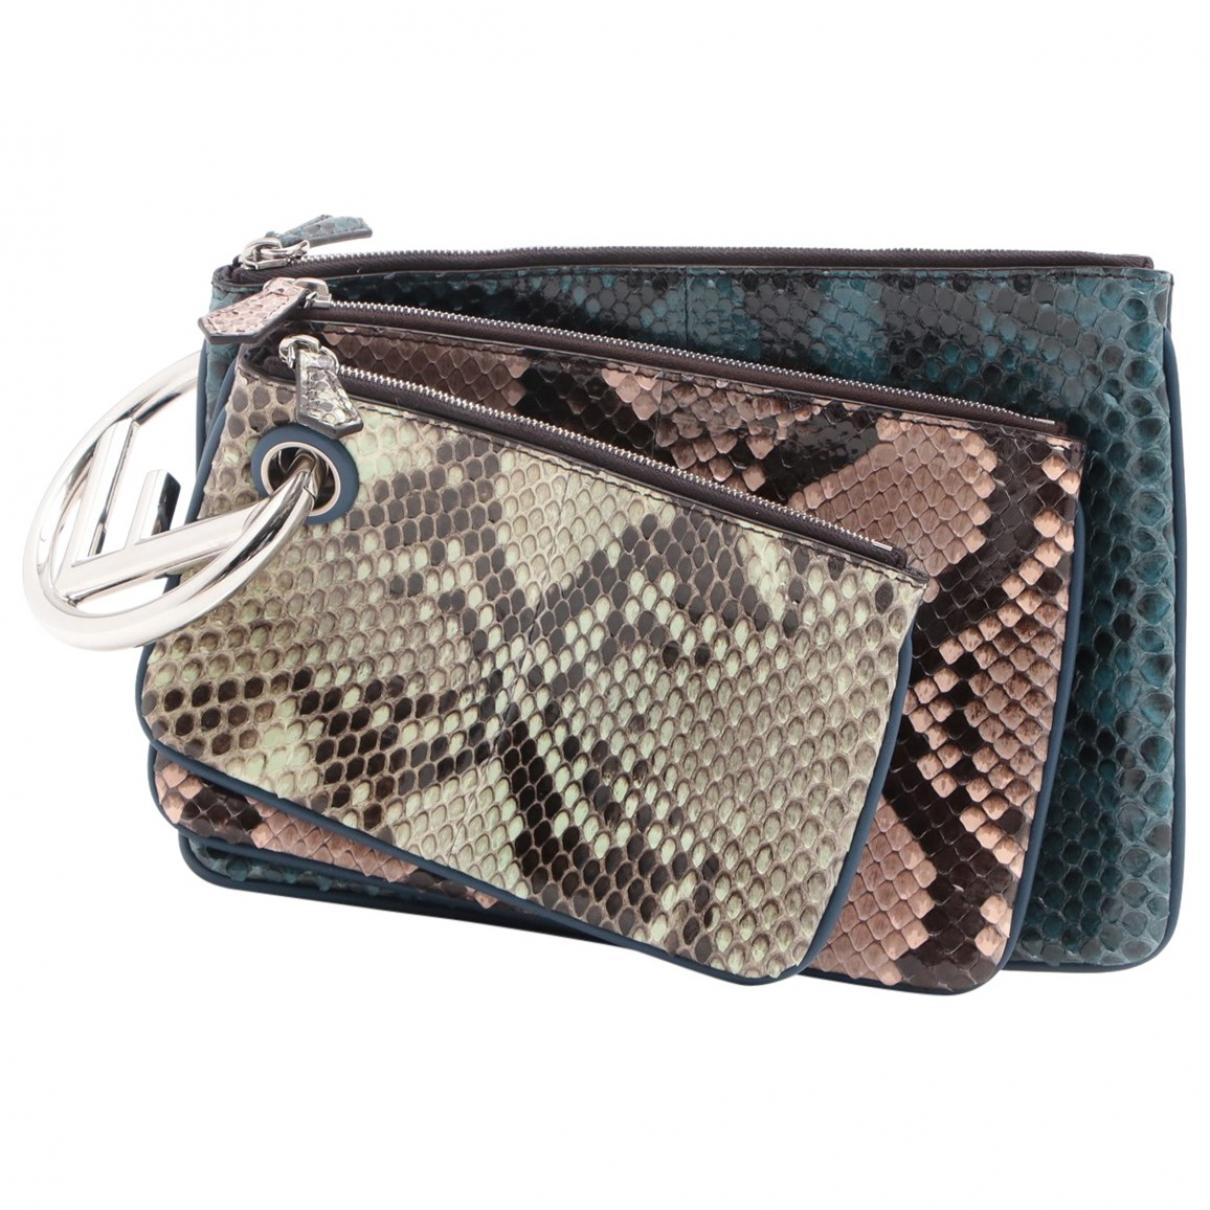 Fendi Triplette Multicolour Leather Clutch bag for Women N